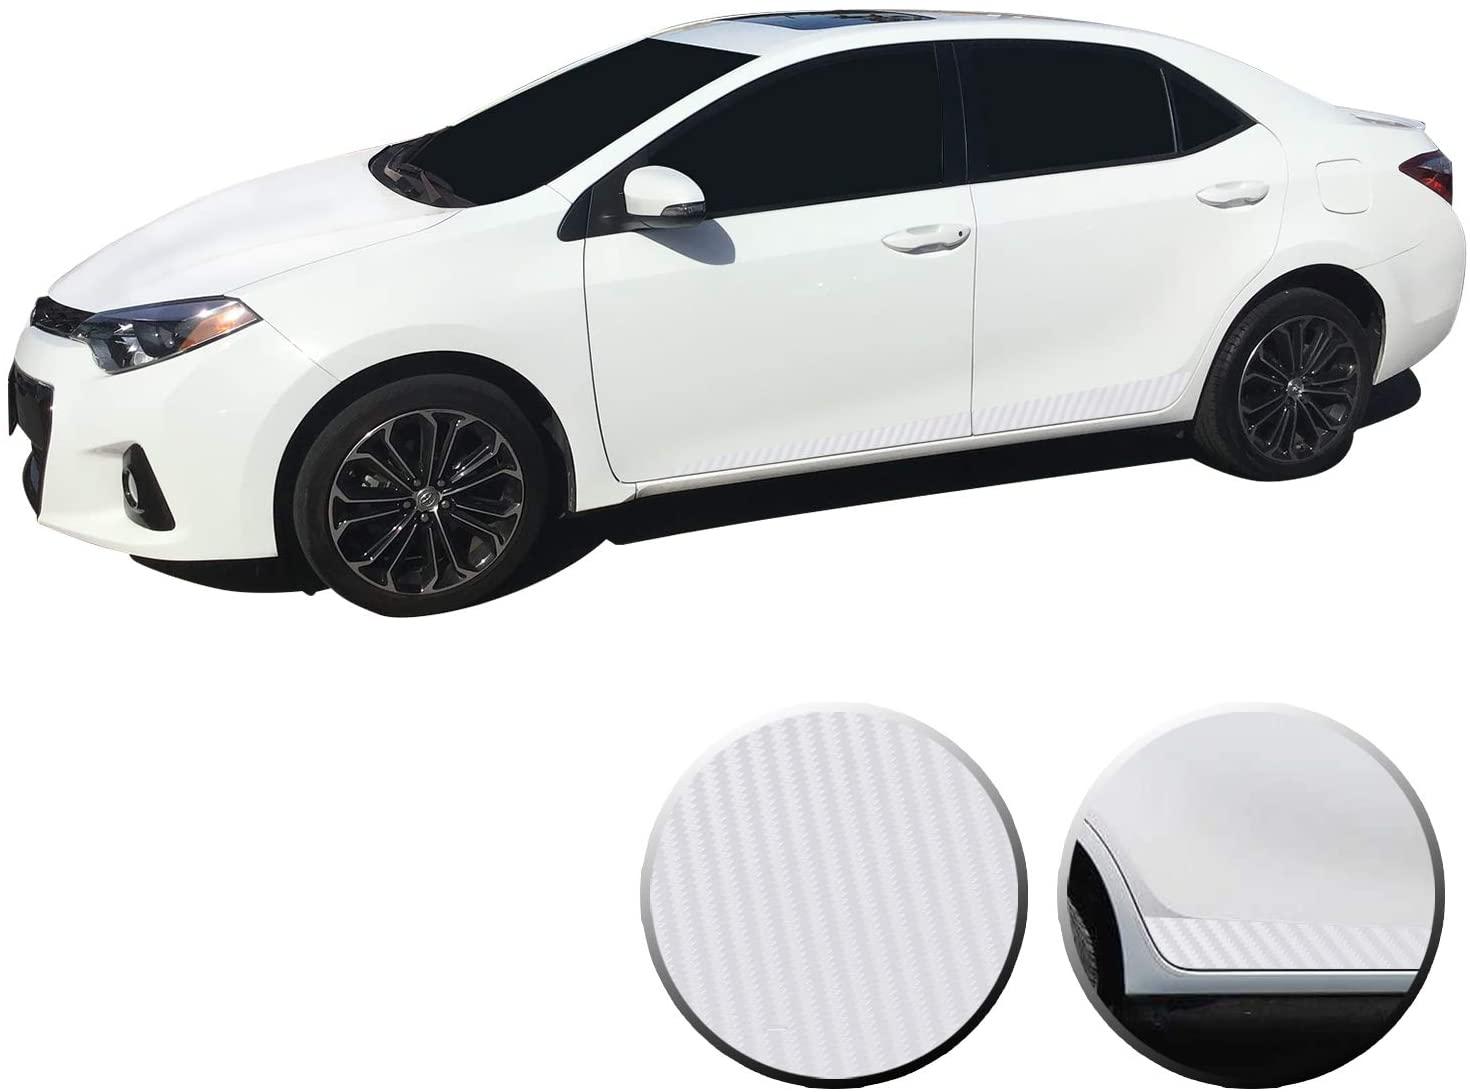 Optix Lower Door Panel Stripes Accent Vinyl Overlay Wrap Trim Compatible with Toyota Corolla 2014 2015 2016 2017 2018 2019 - Carbon Fiber White